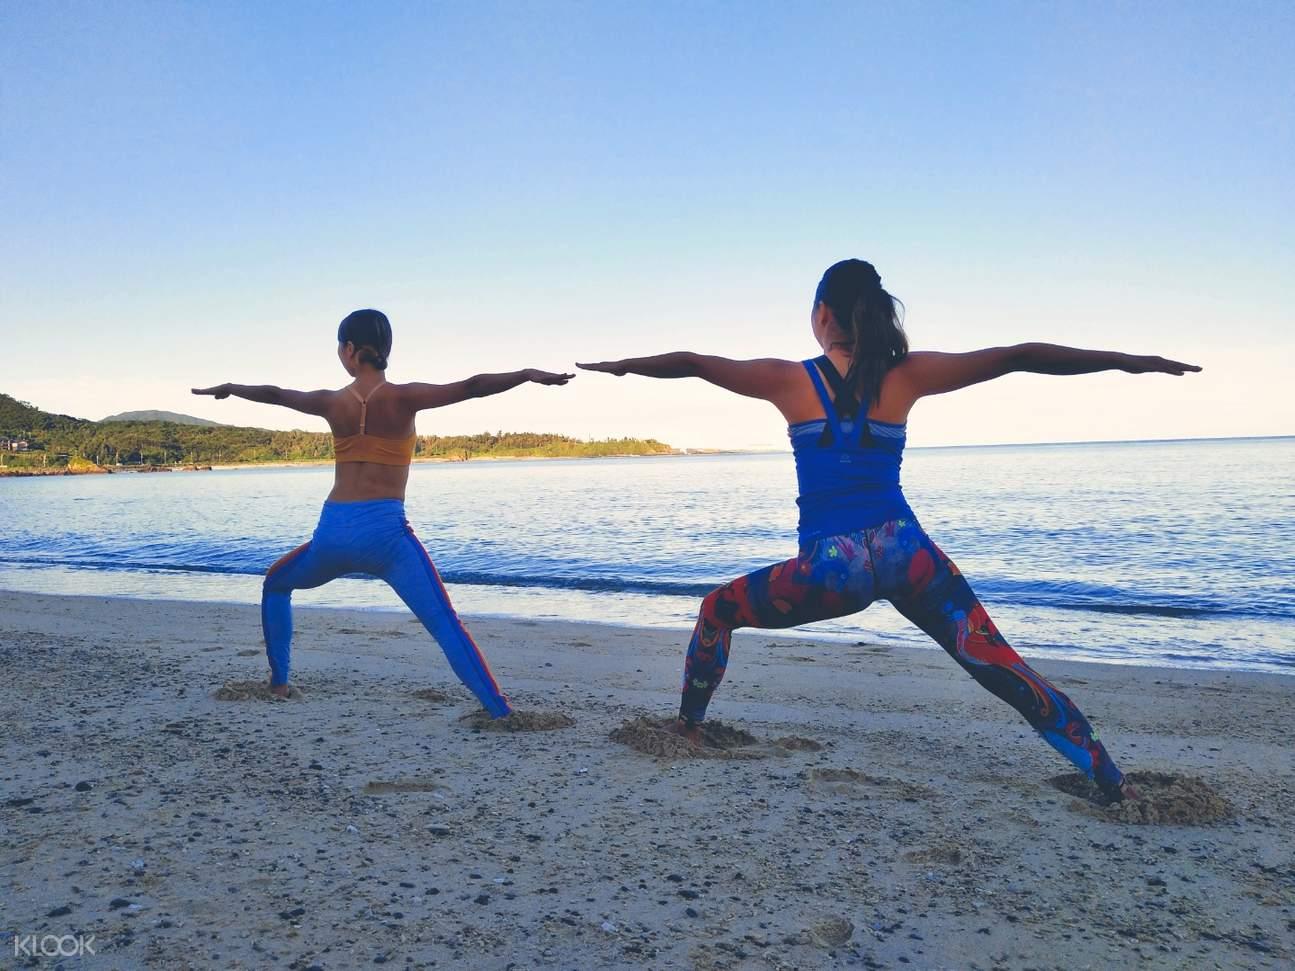 Trial Meditation Yoga Course in Okinawa